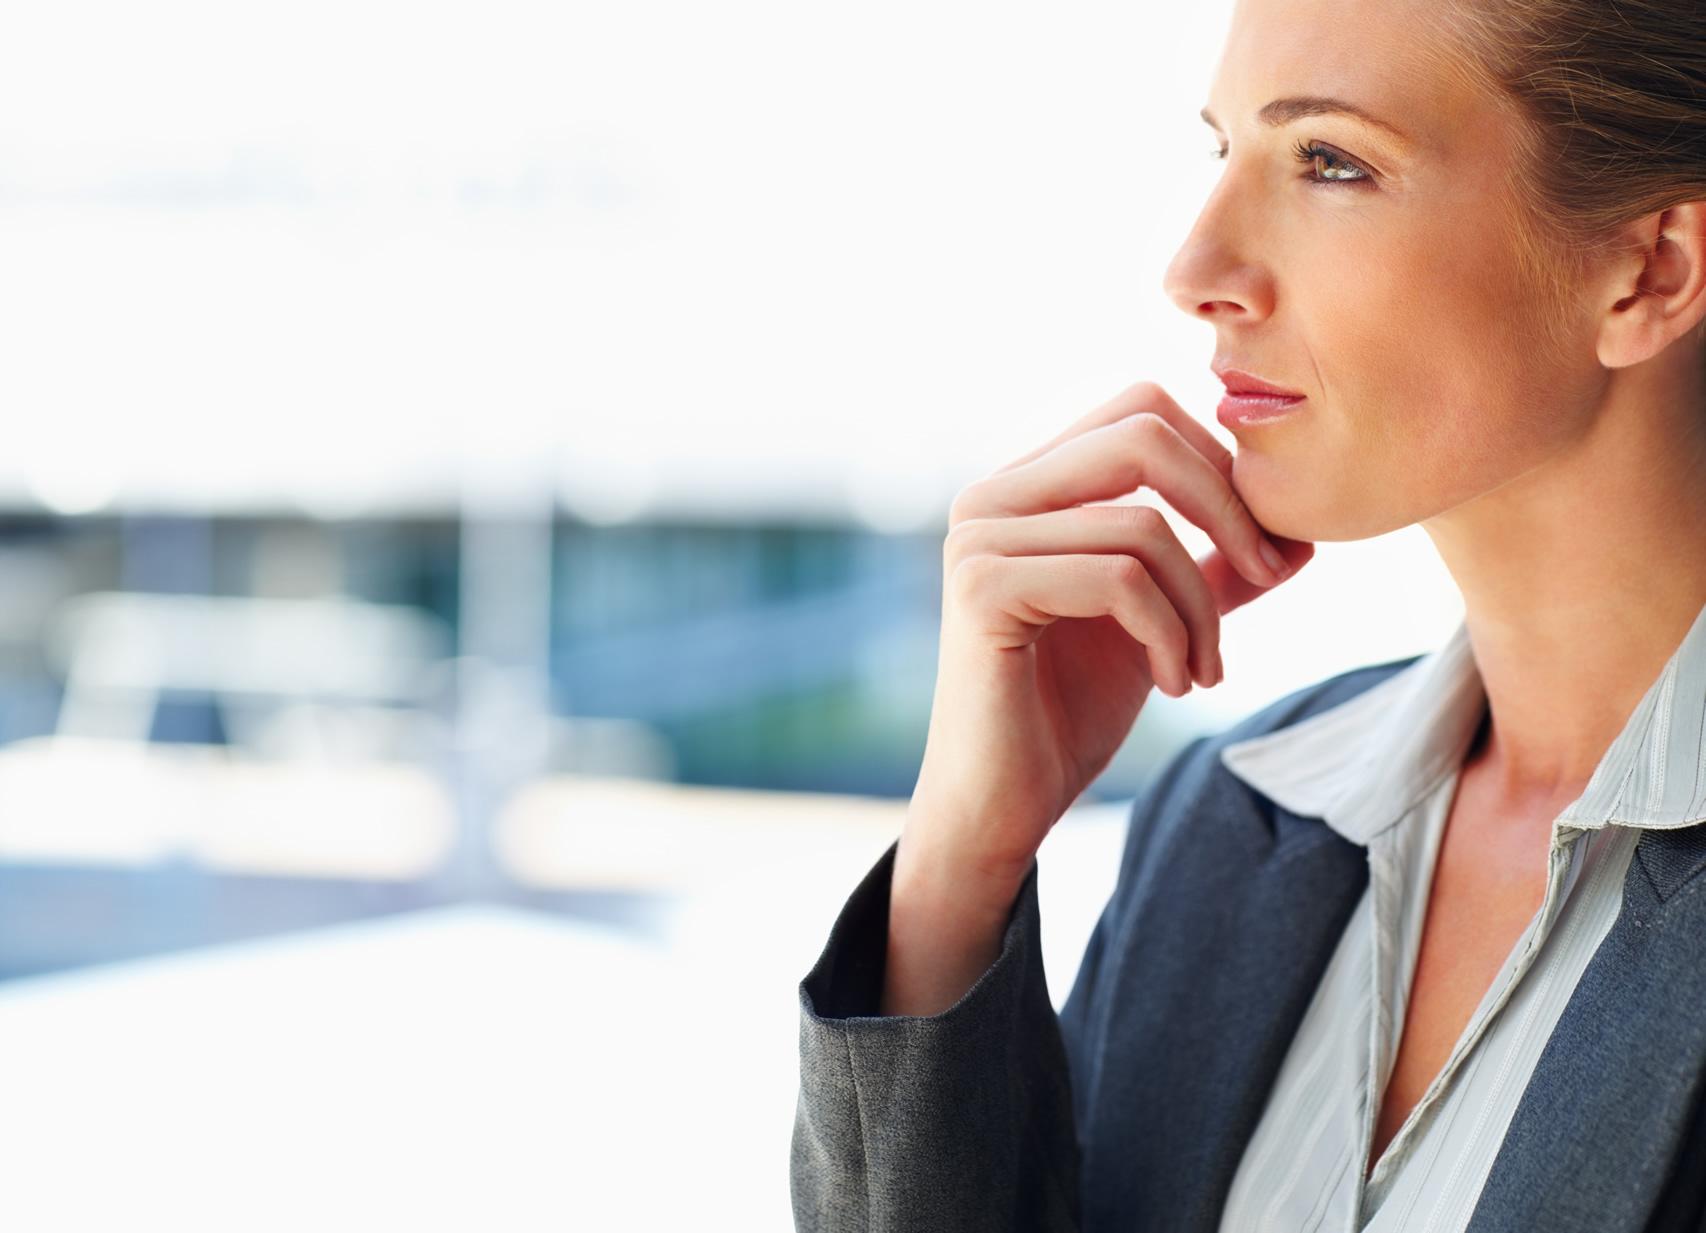 Business-woman-pqno